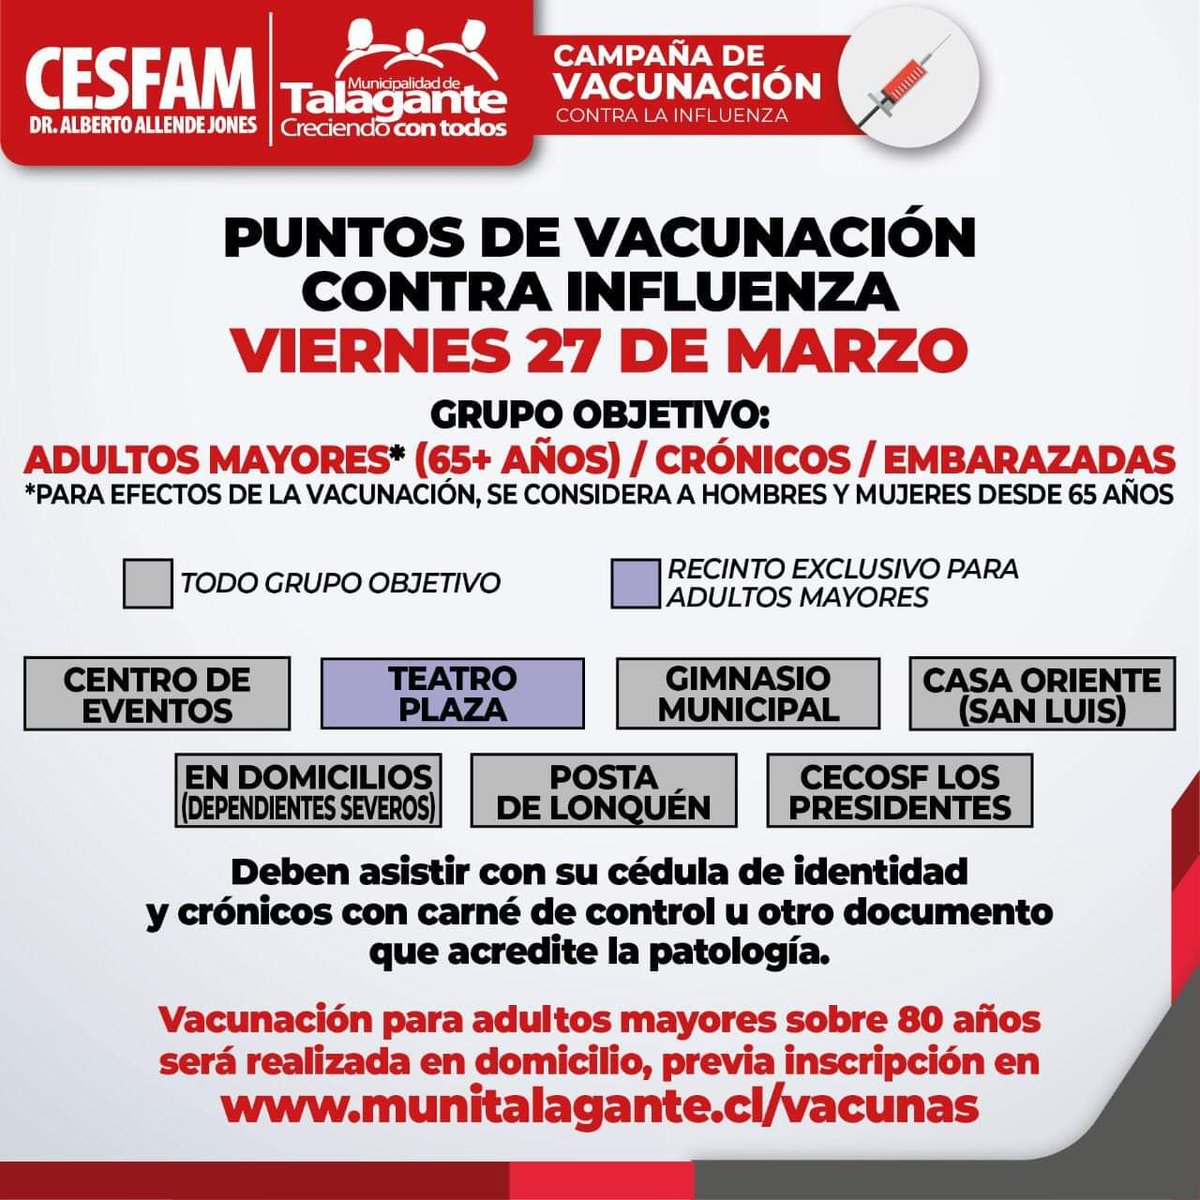 dosis de vacuna influenza para adultos mayores